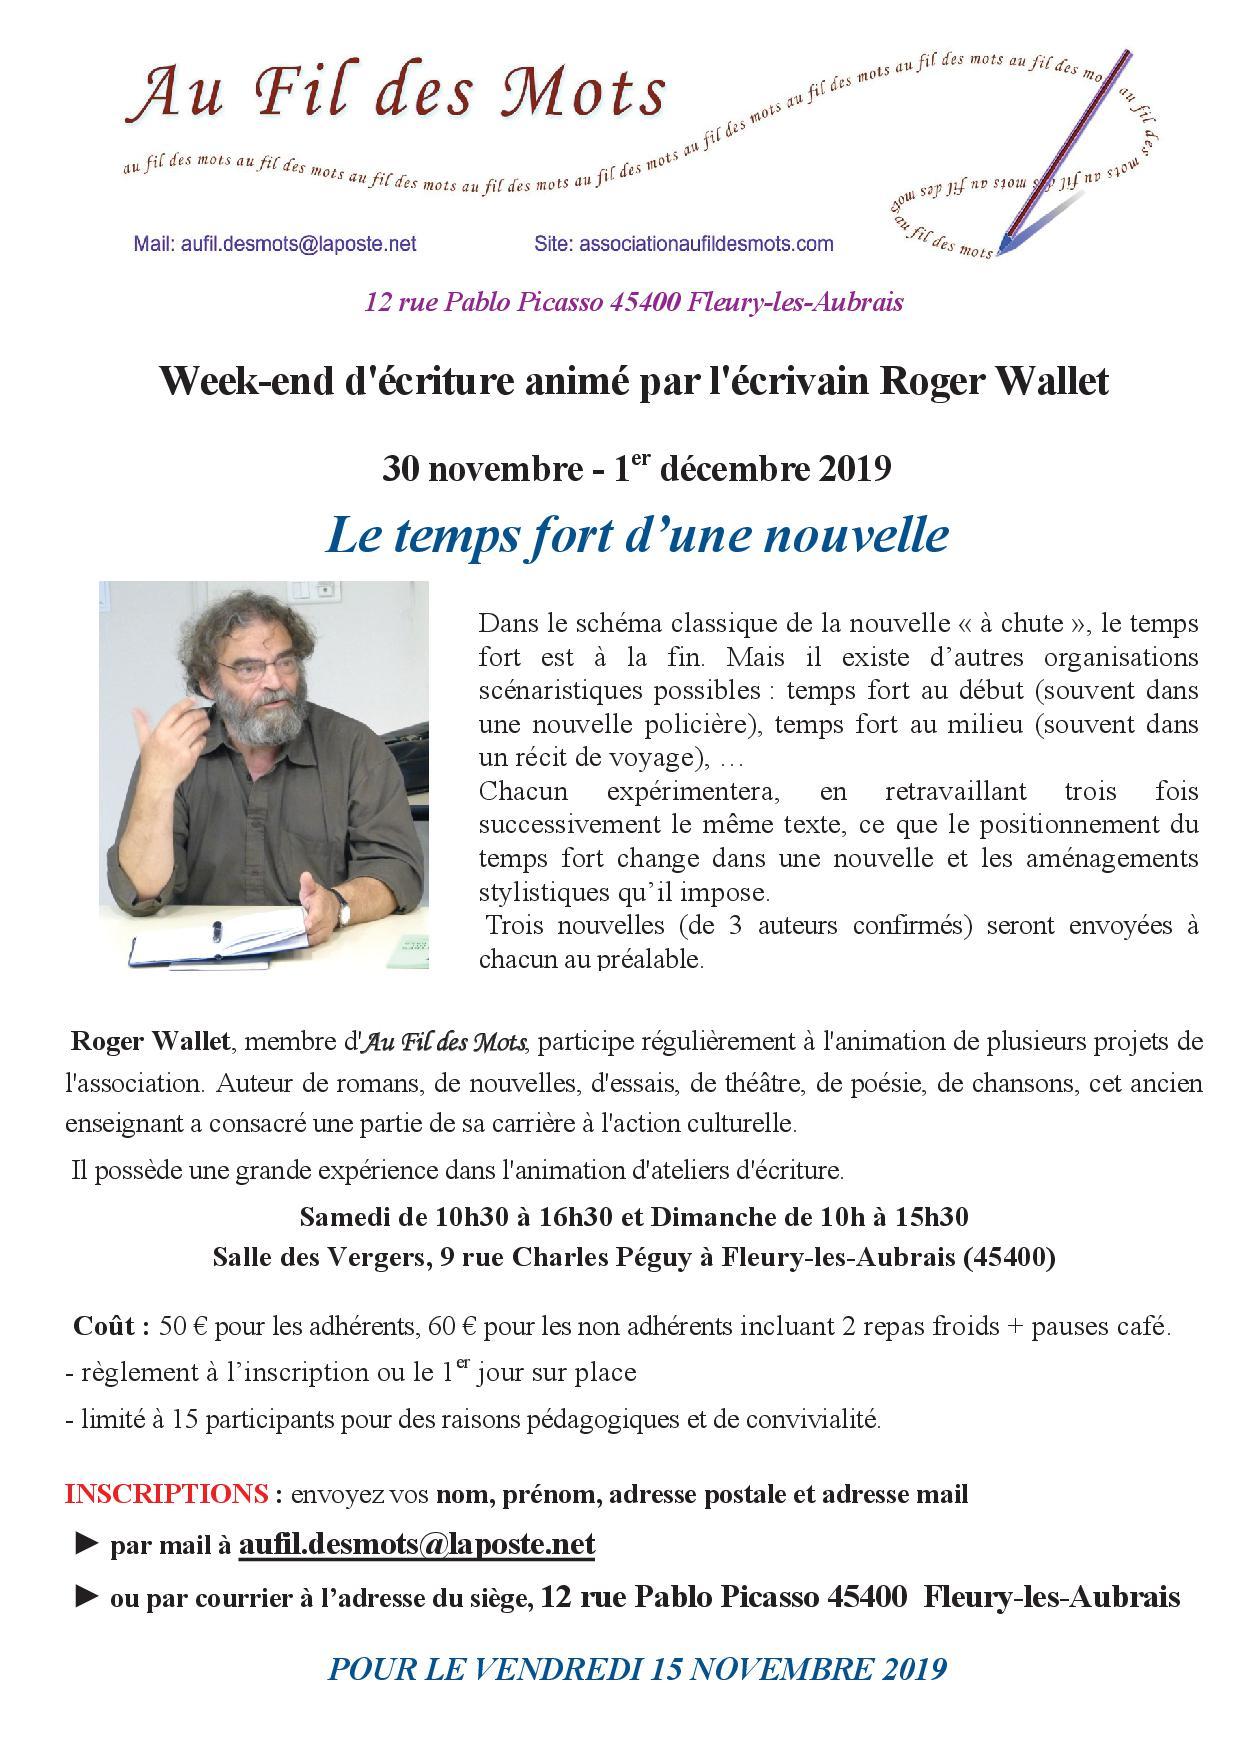 Atelier_Roger_Wallet_2019_temps_fort_nouvelle.jpg